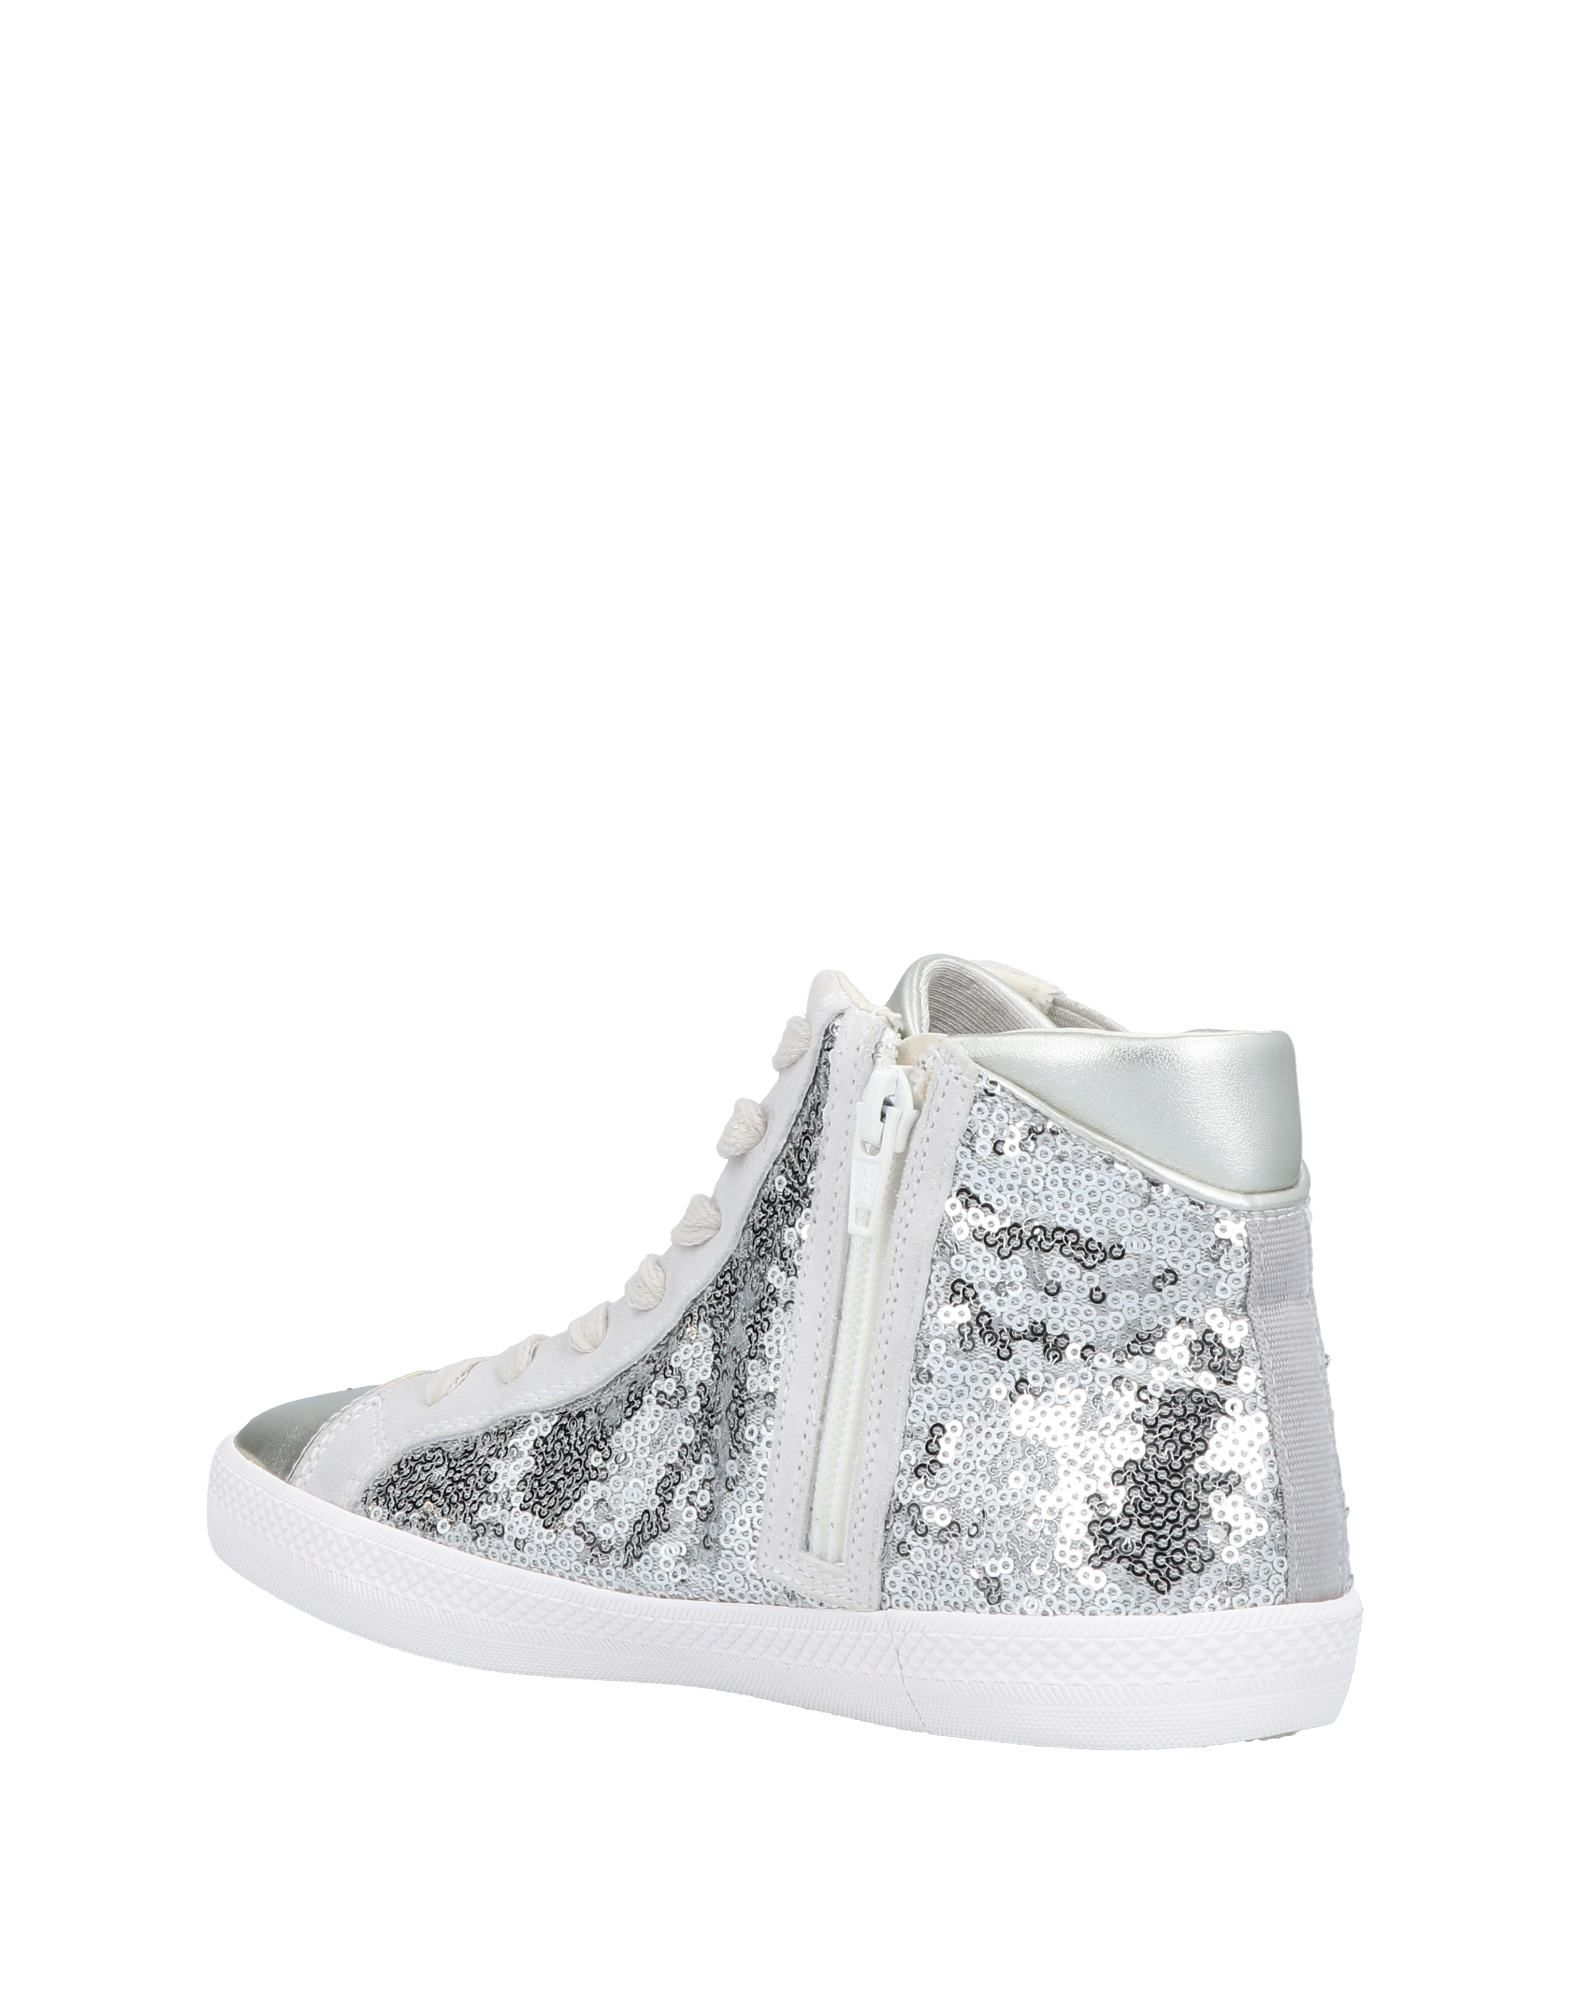 Geox Sneakers Damen  beliebte 11453355CU Gute Qualität beliebte  Schuhe b7c878